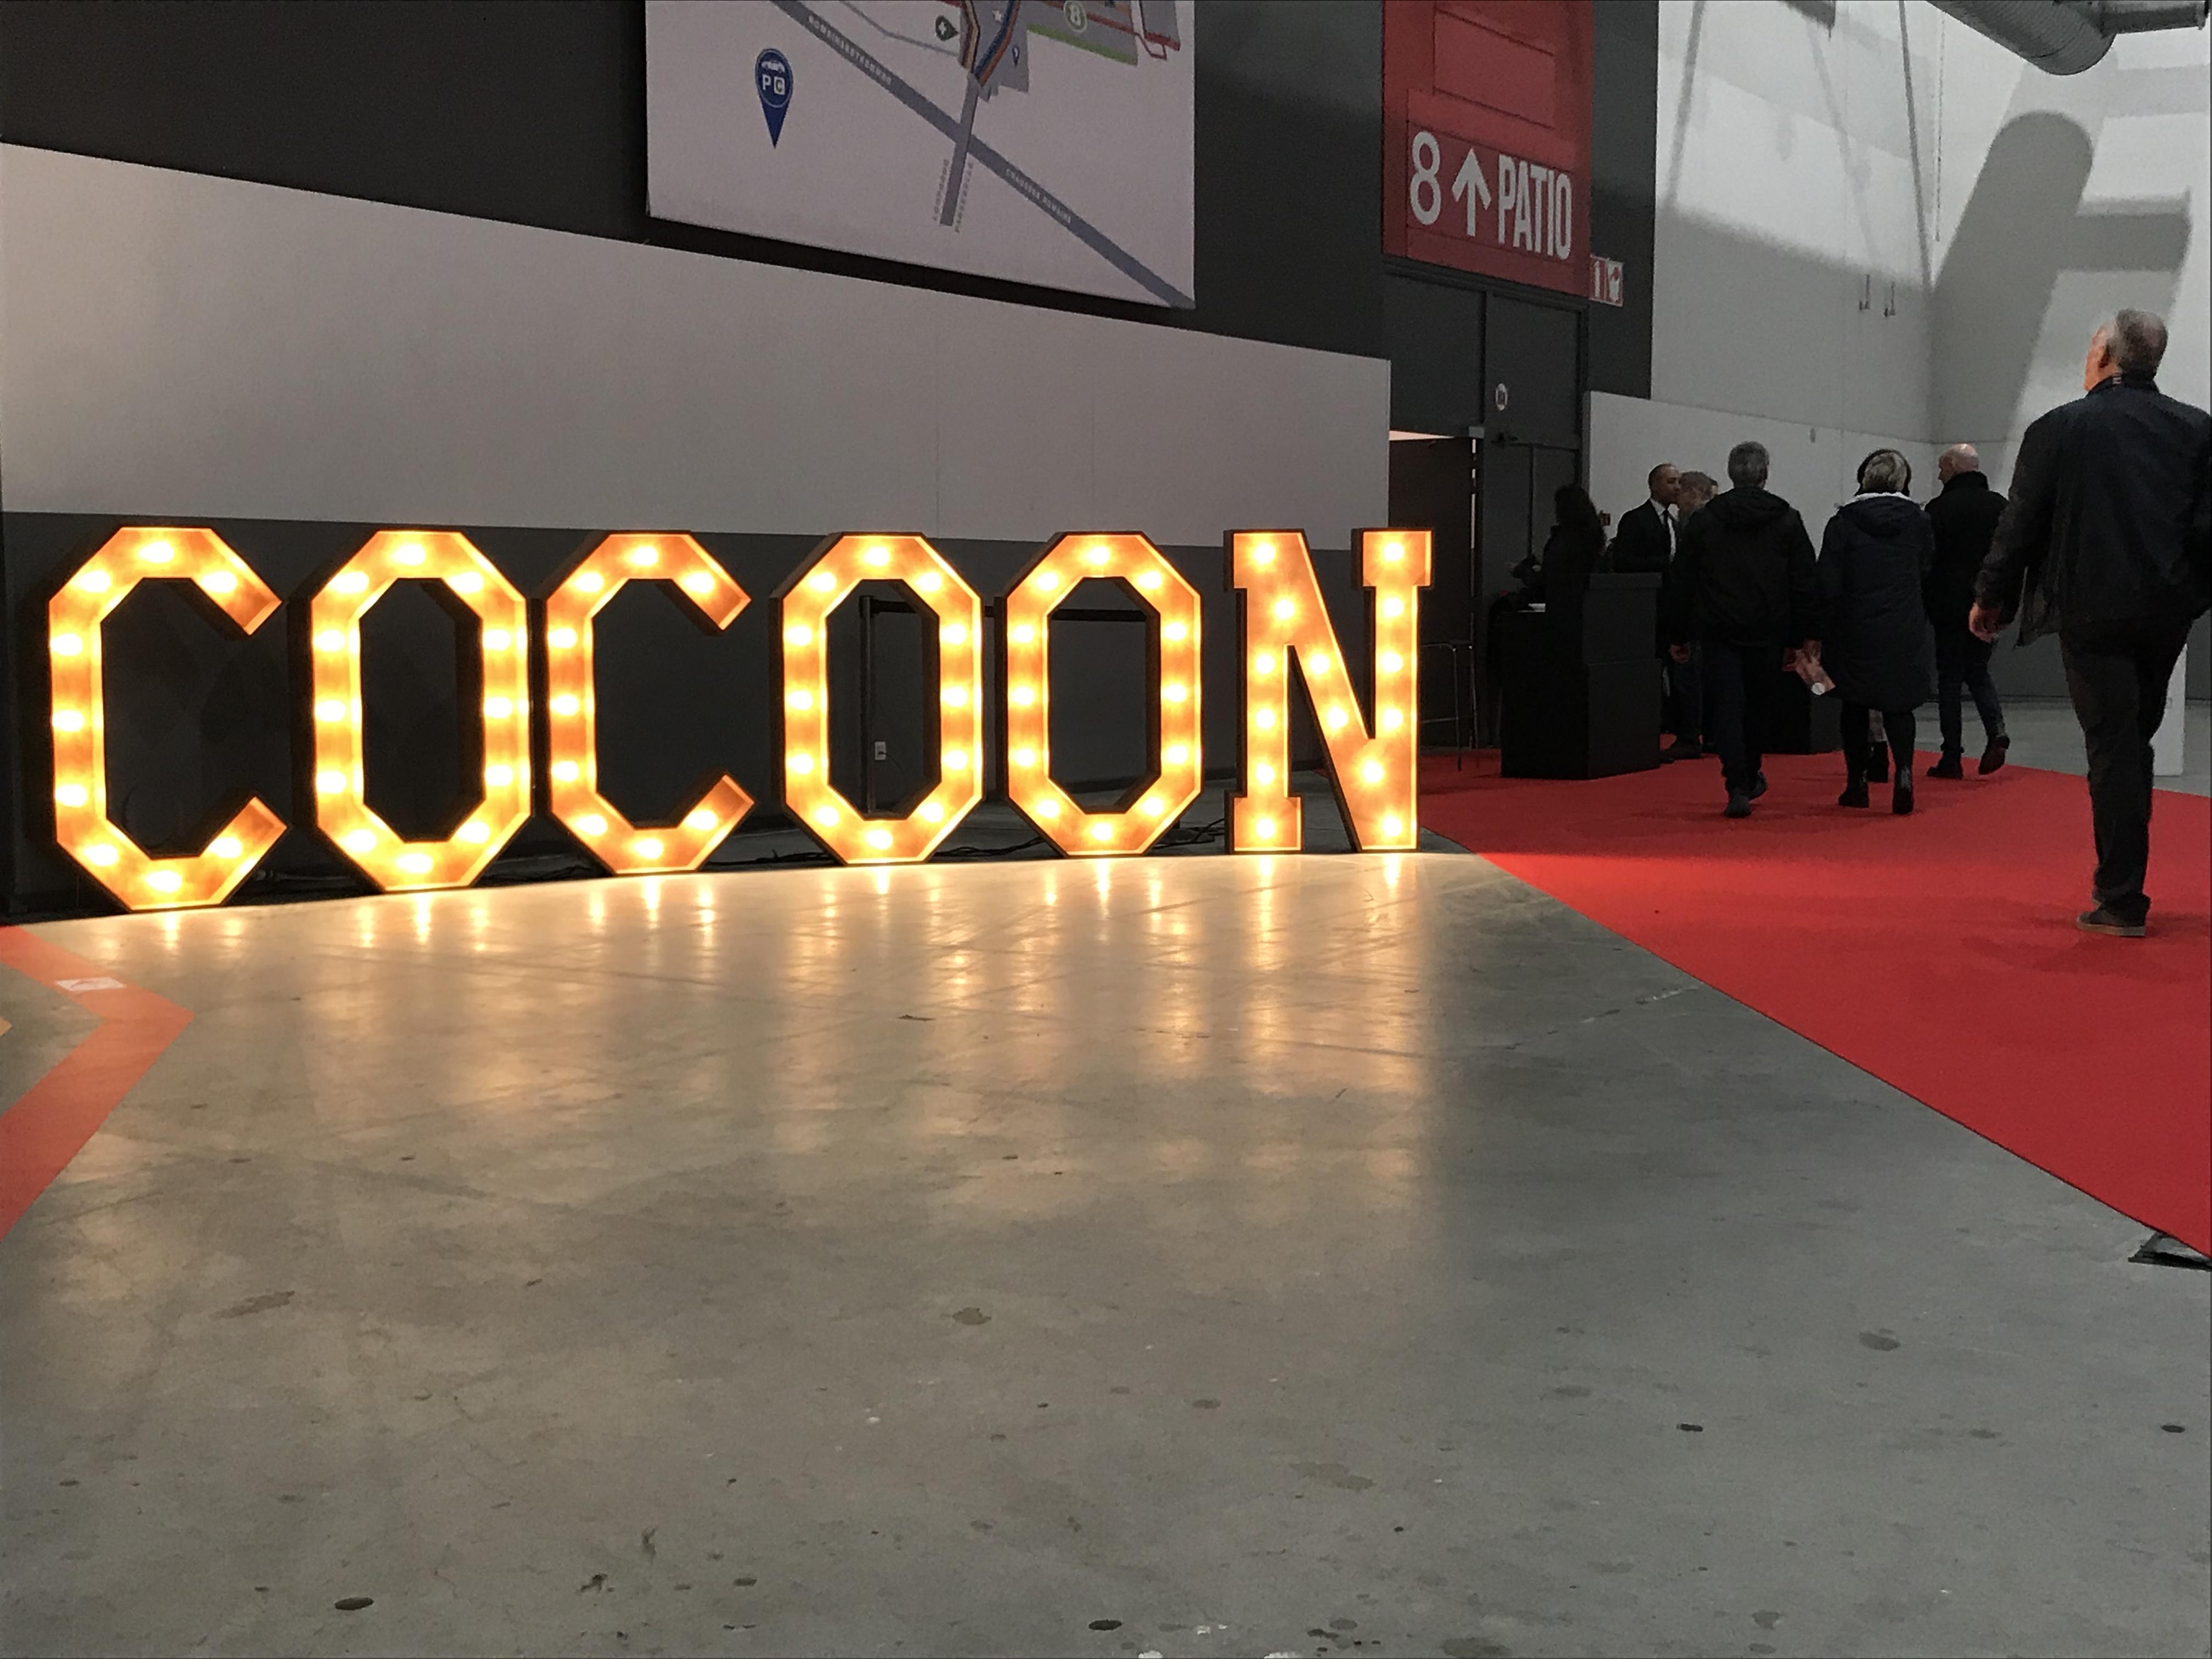 Flashletters - COCOON